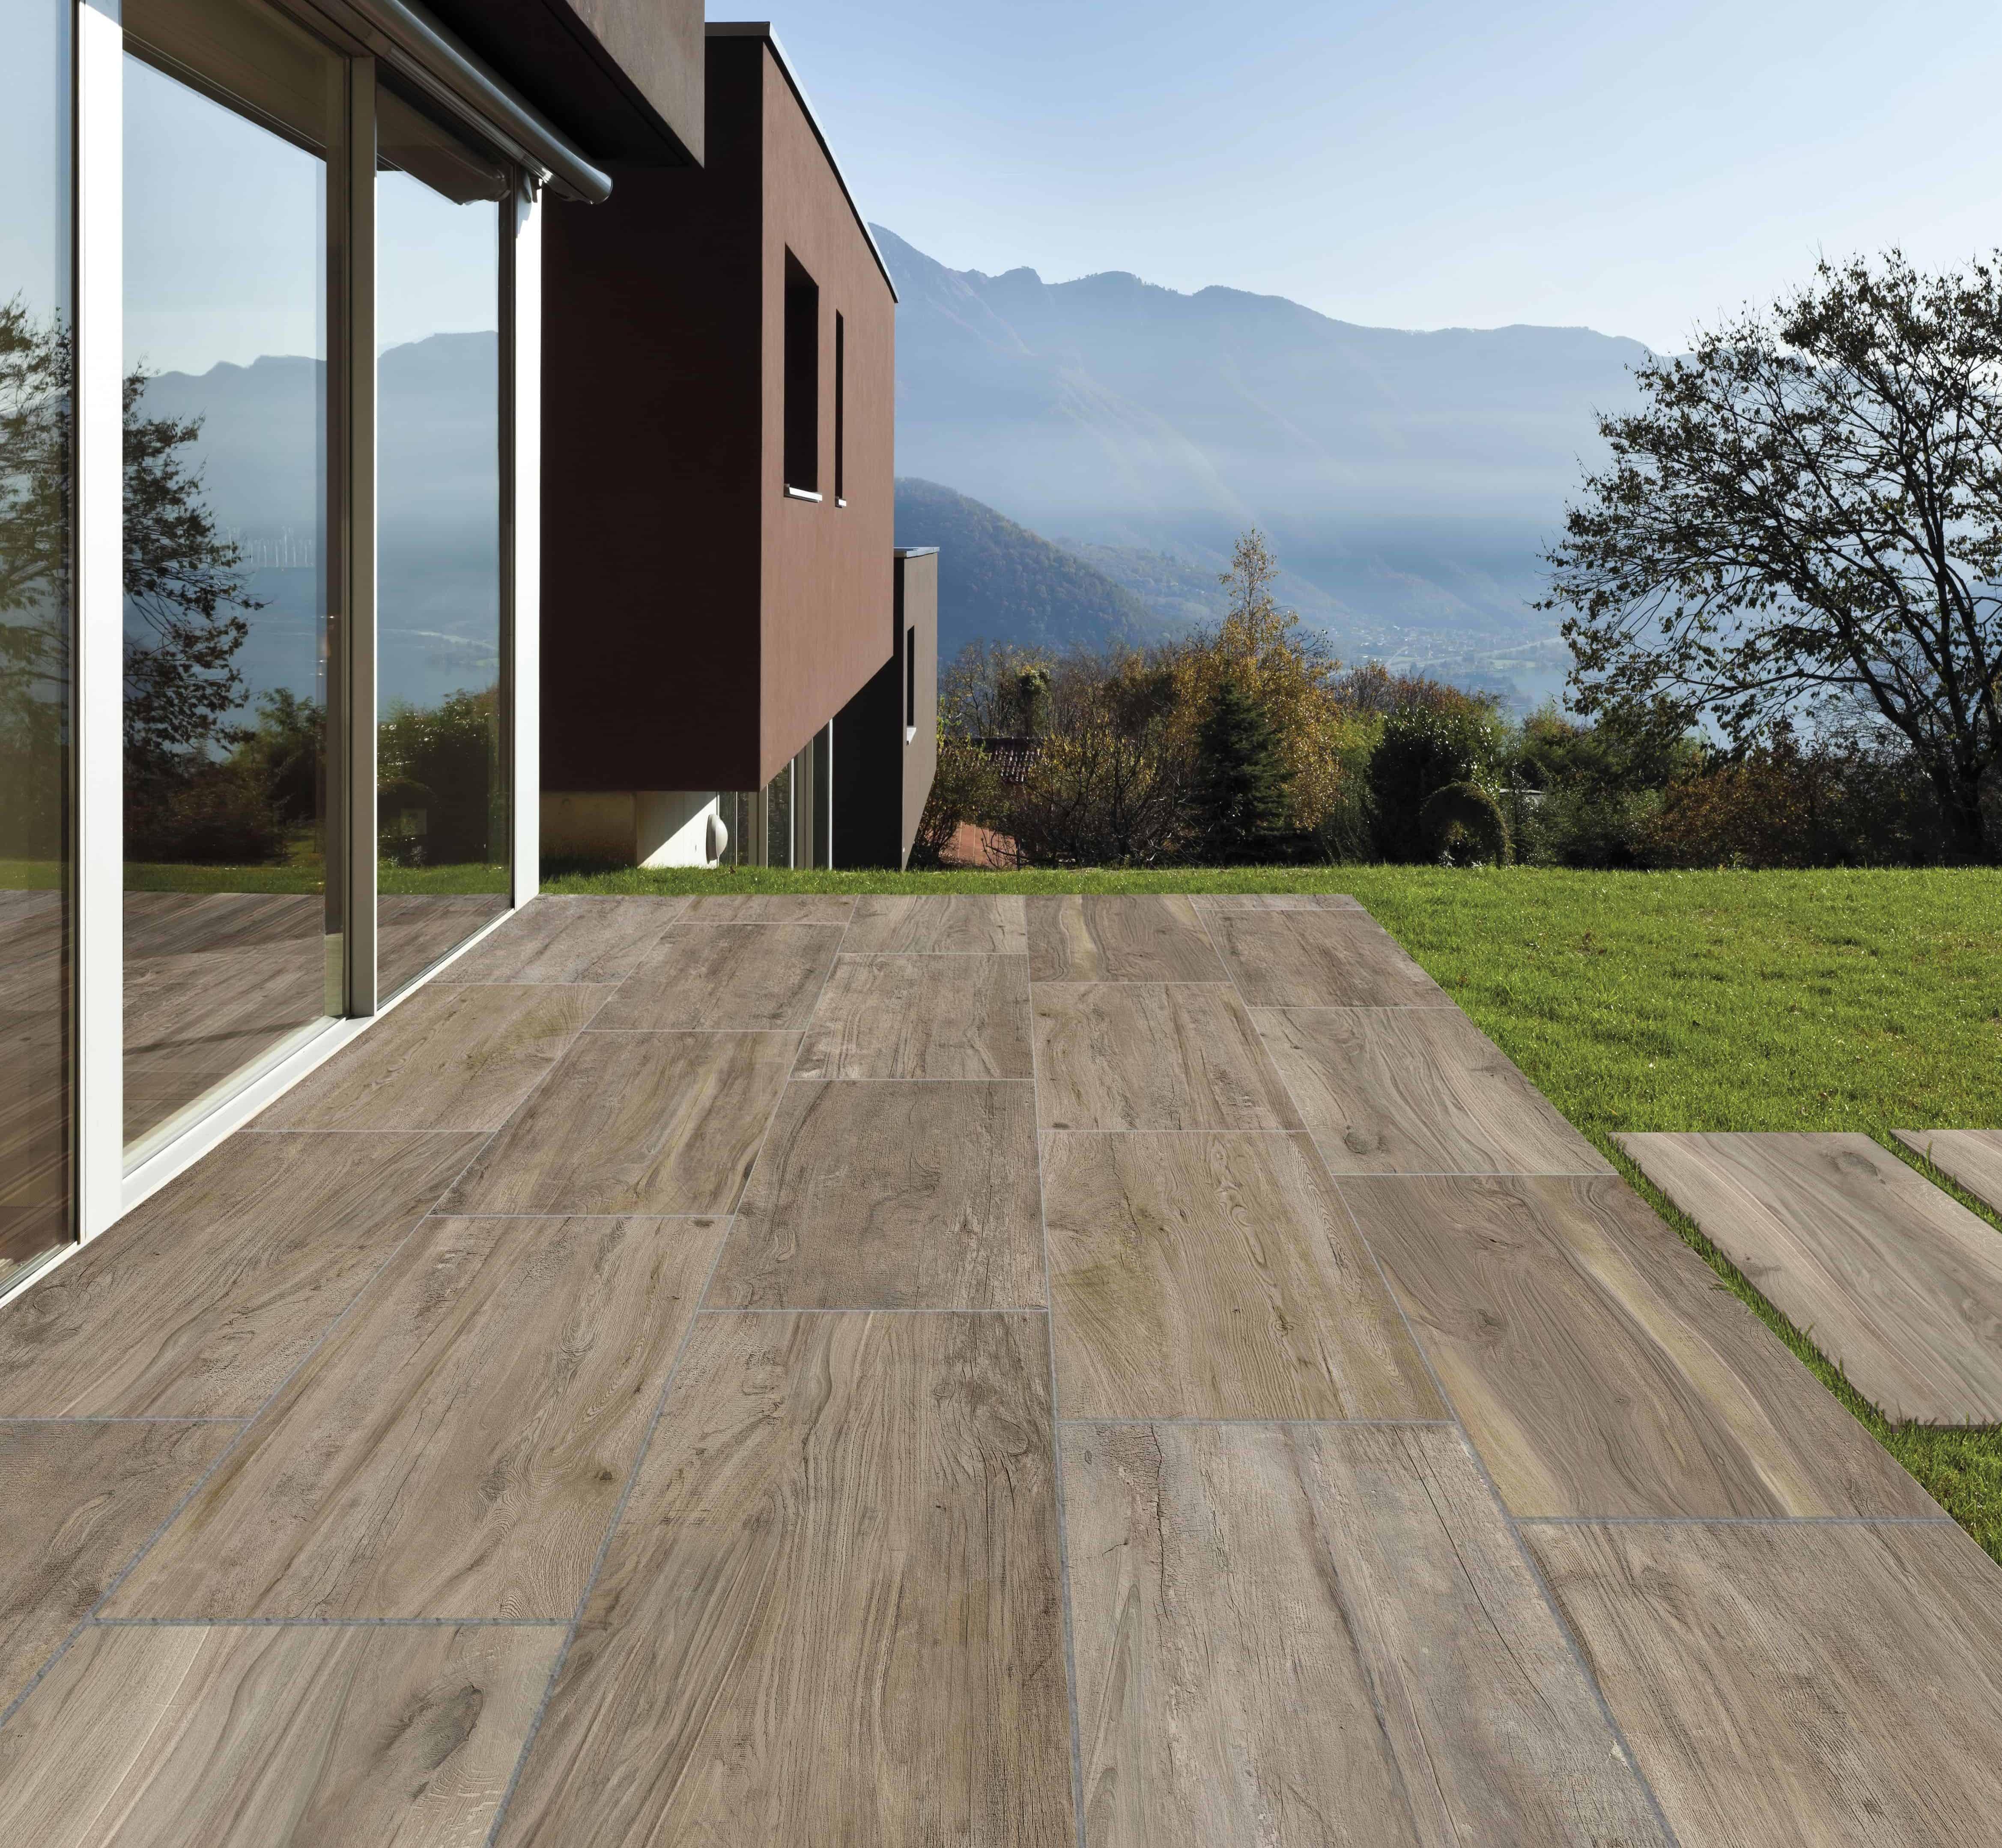 rondine ceramica hard and soft h20 collection outdoor indoor floor tiles brown